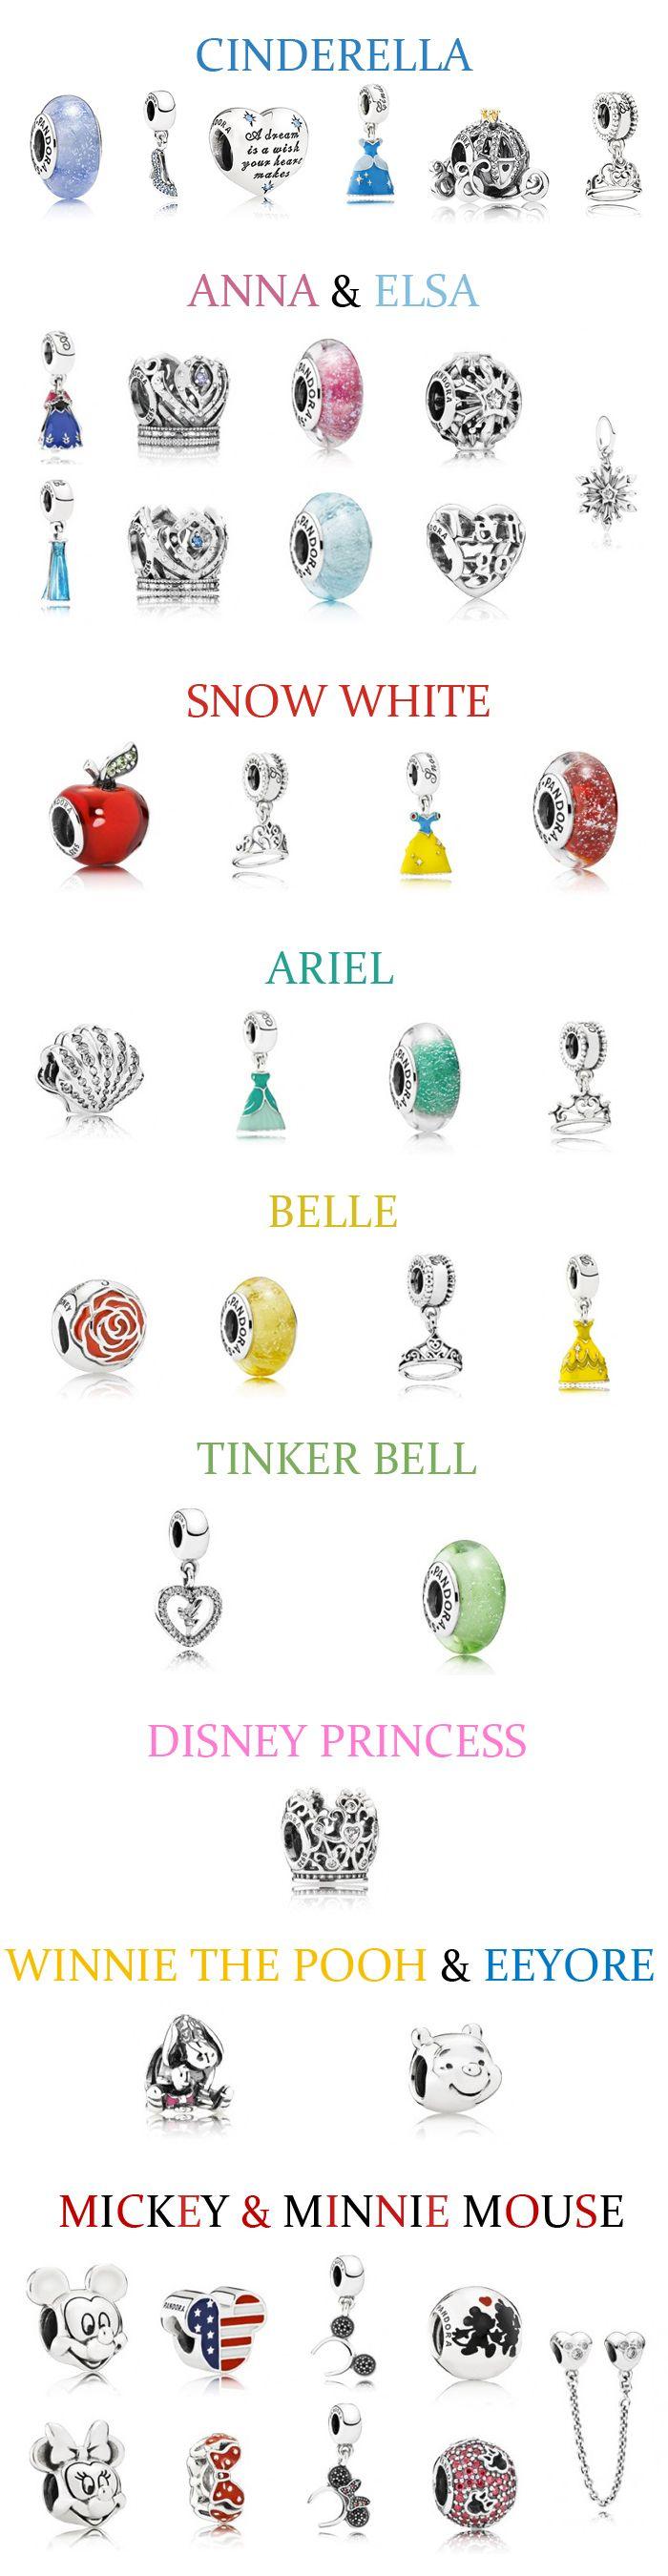 Pin on Disney Aesthetic, Ideas & Parks